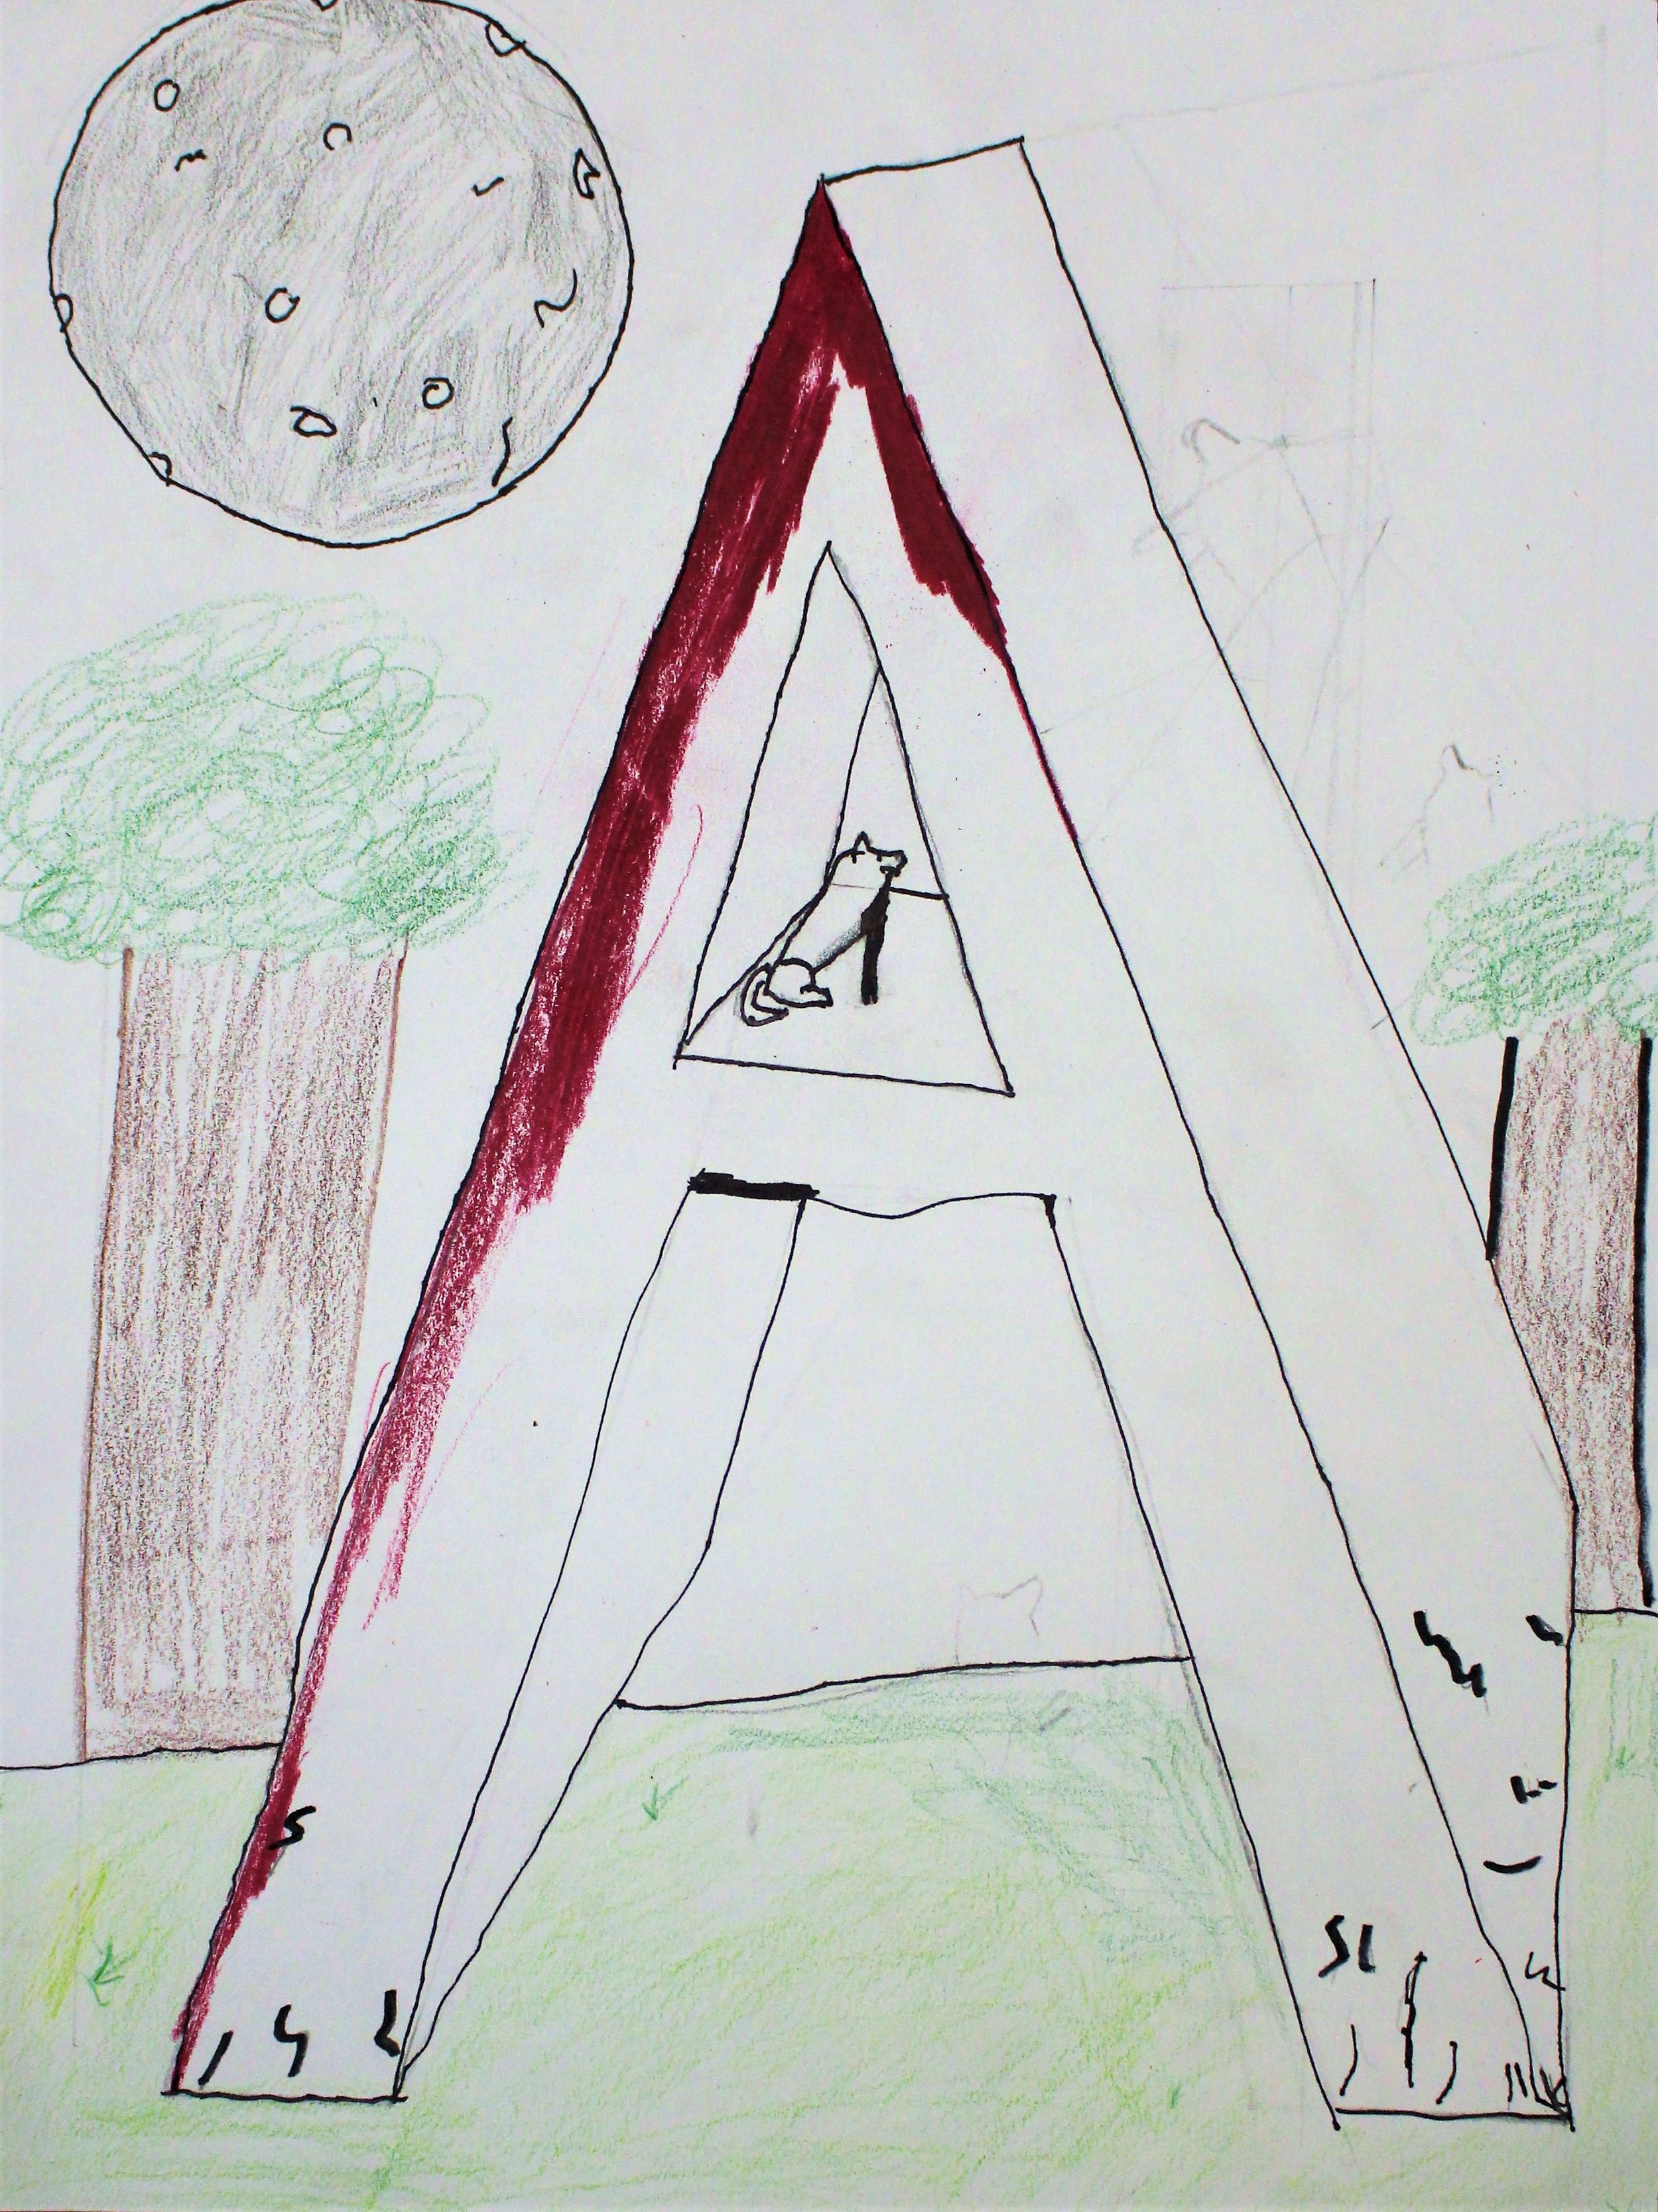 Grade 5: Alyssa C. - Illuminated Initial (Work In Progress)